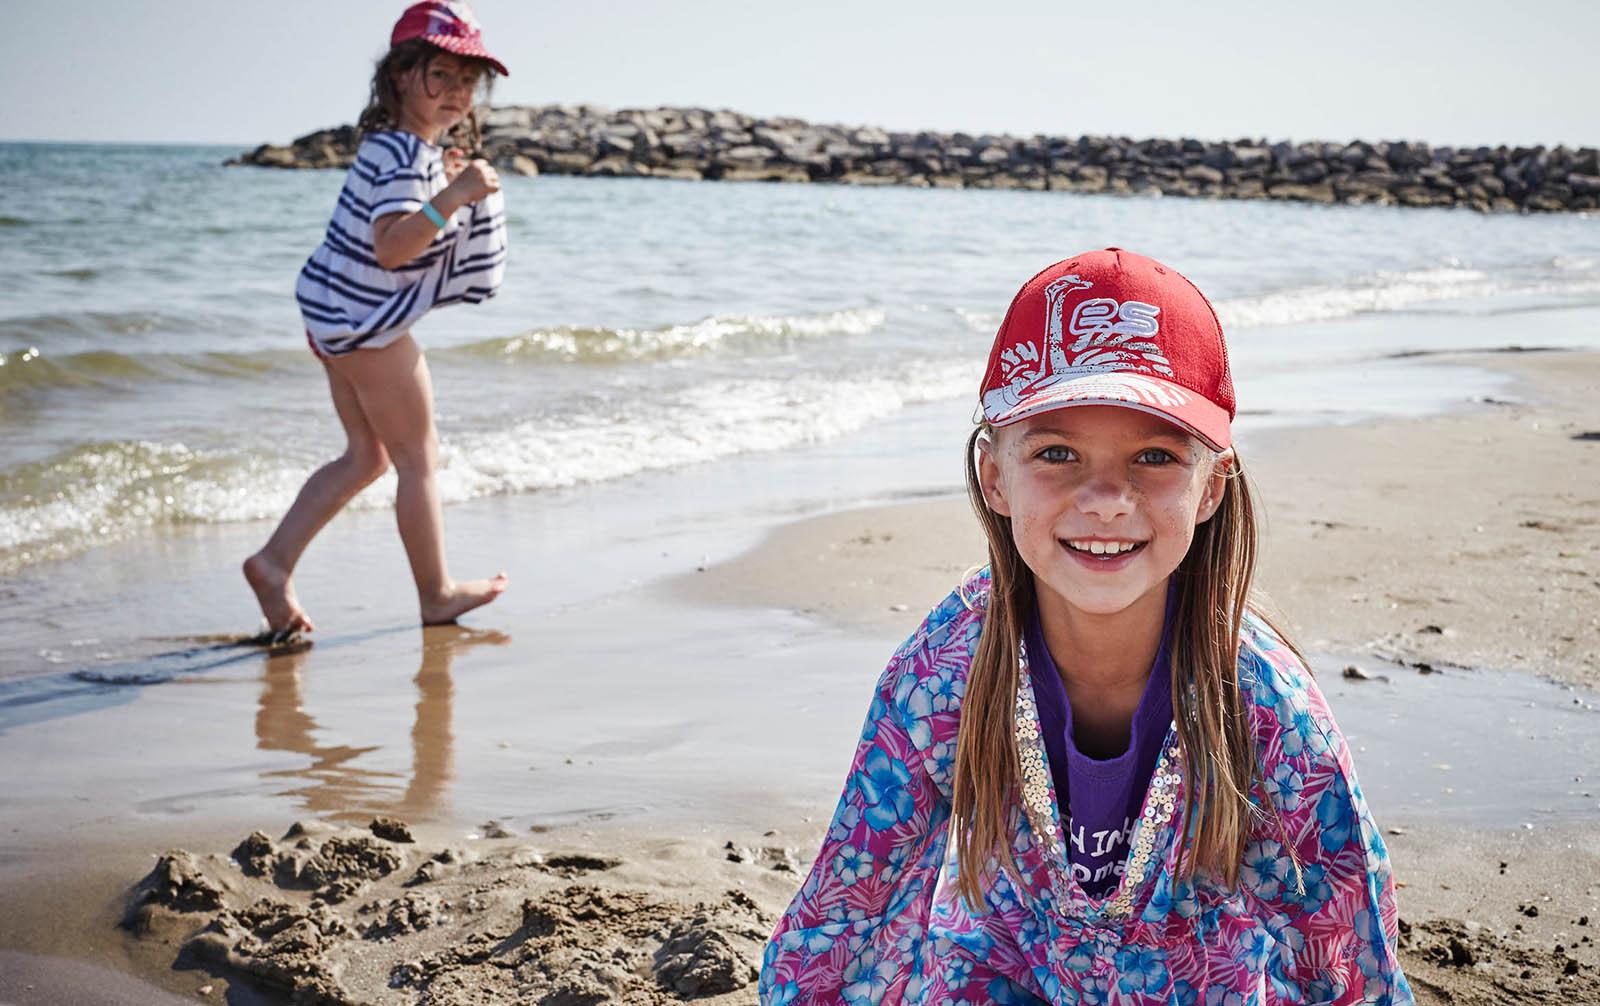 7-Bambini-kids-spiaggia-kinder-strand